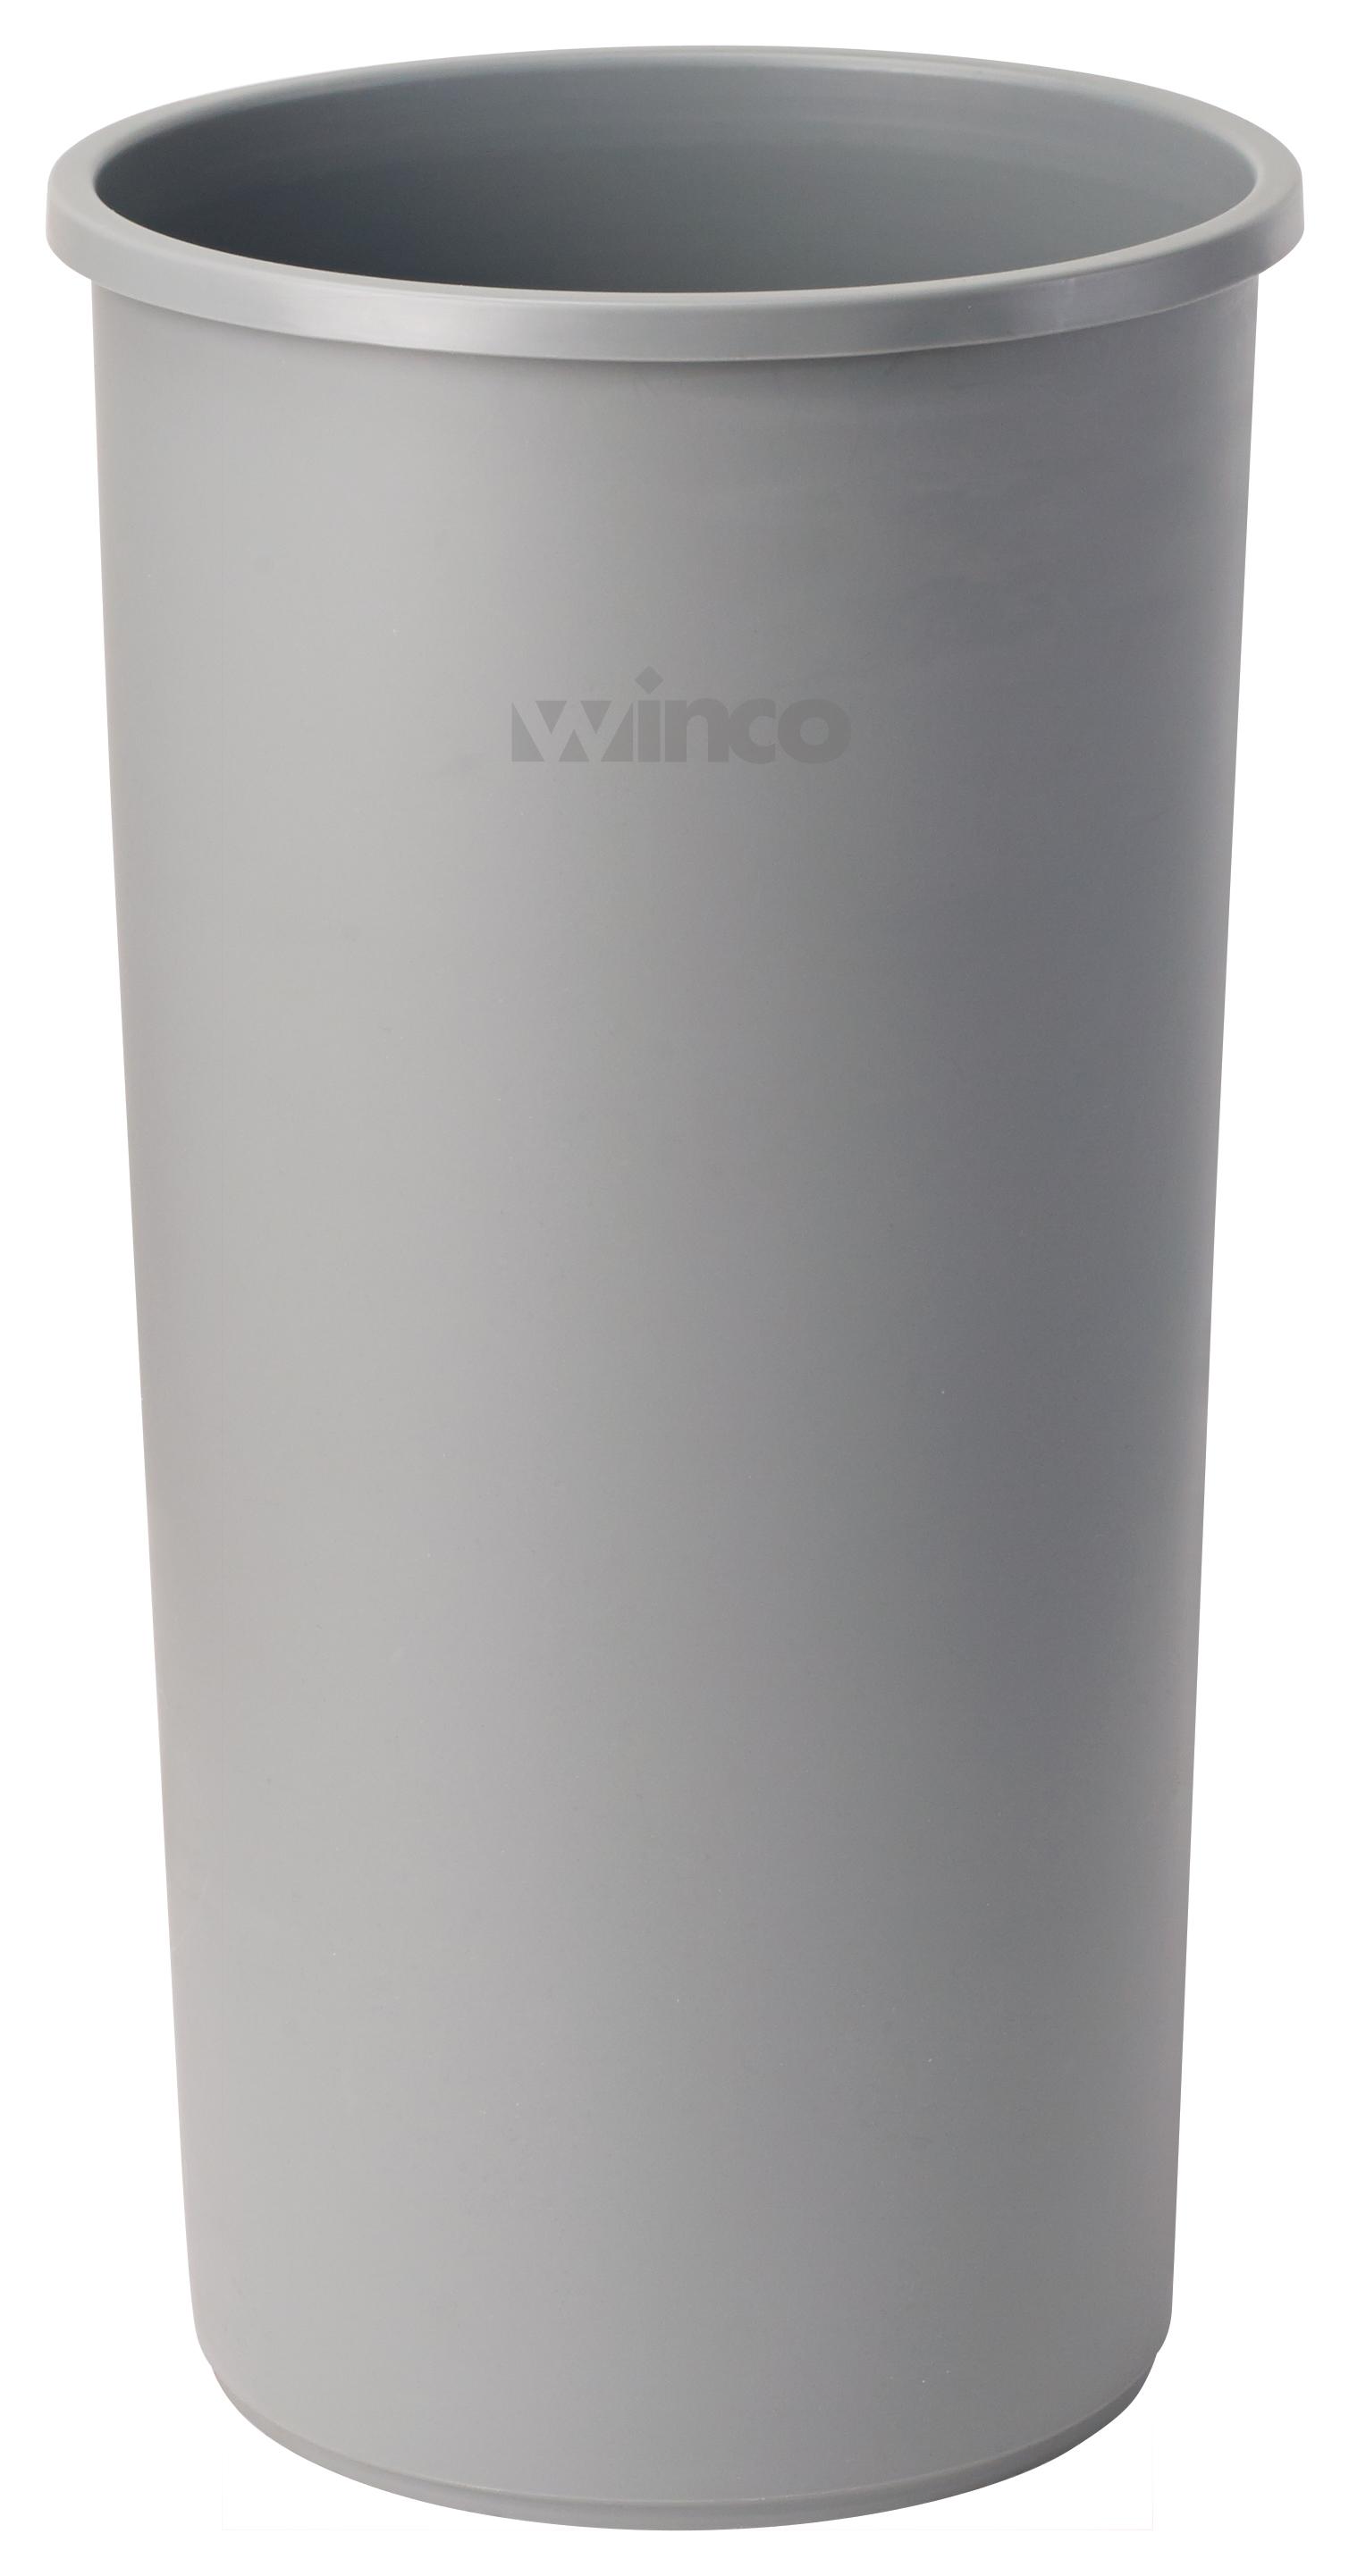 Winco PTC-20G round trash can